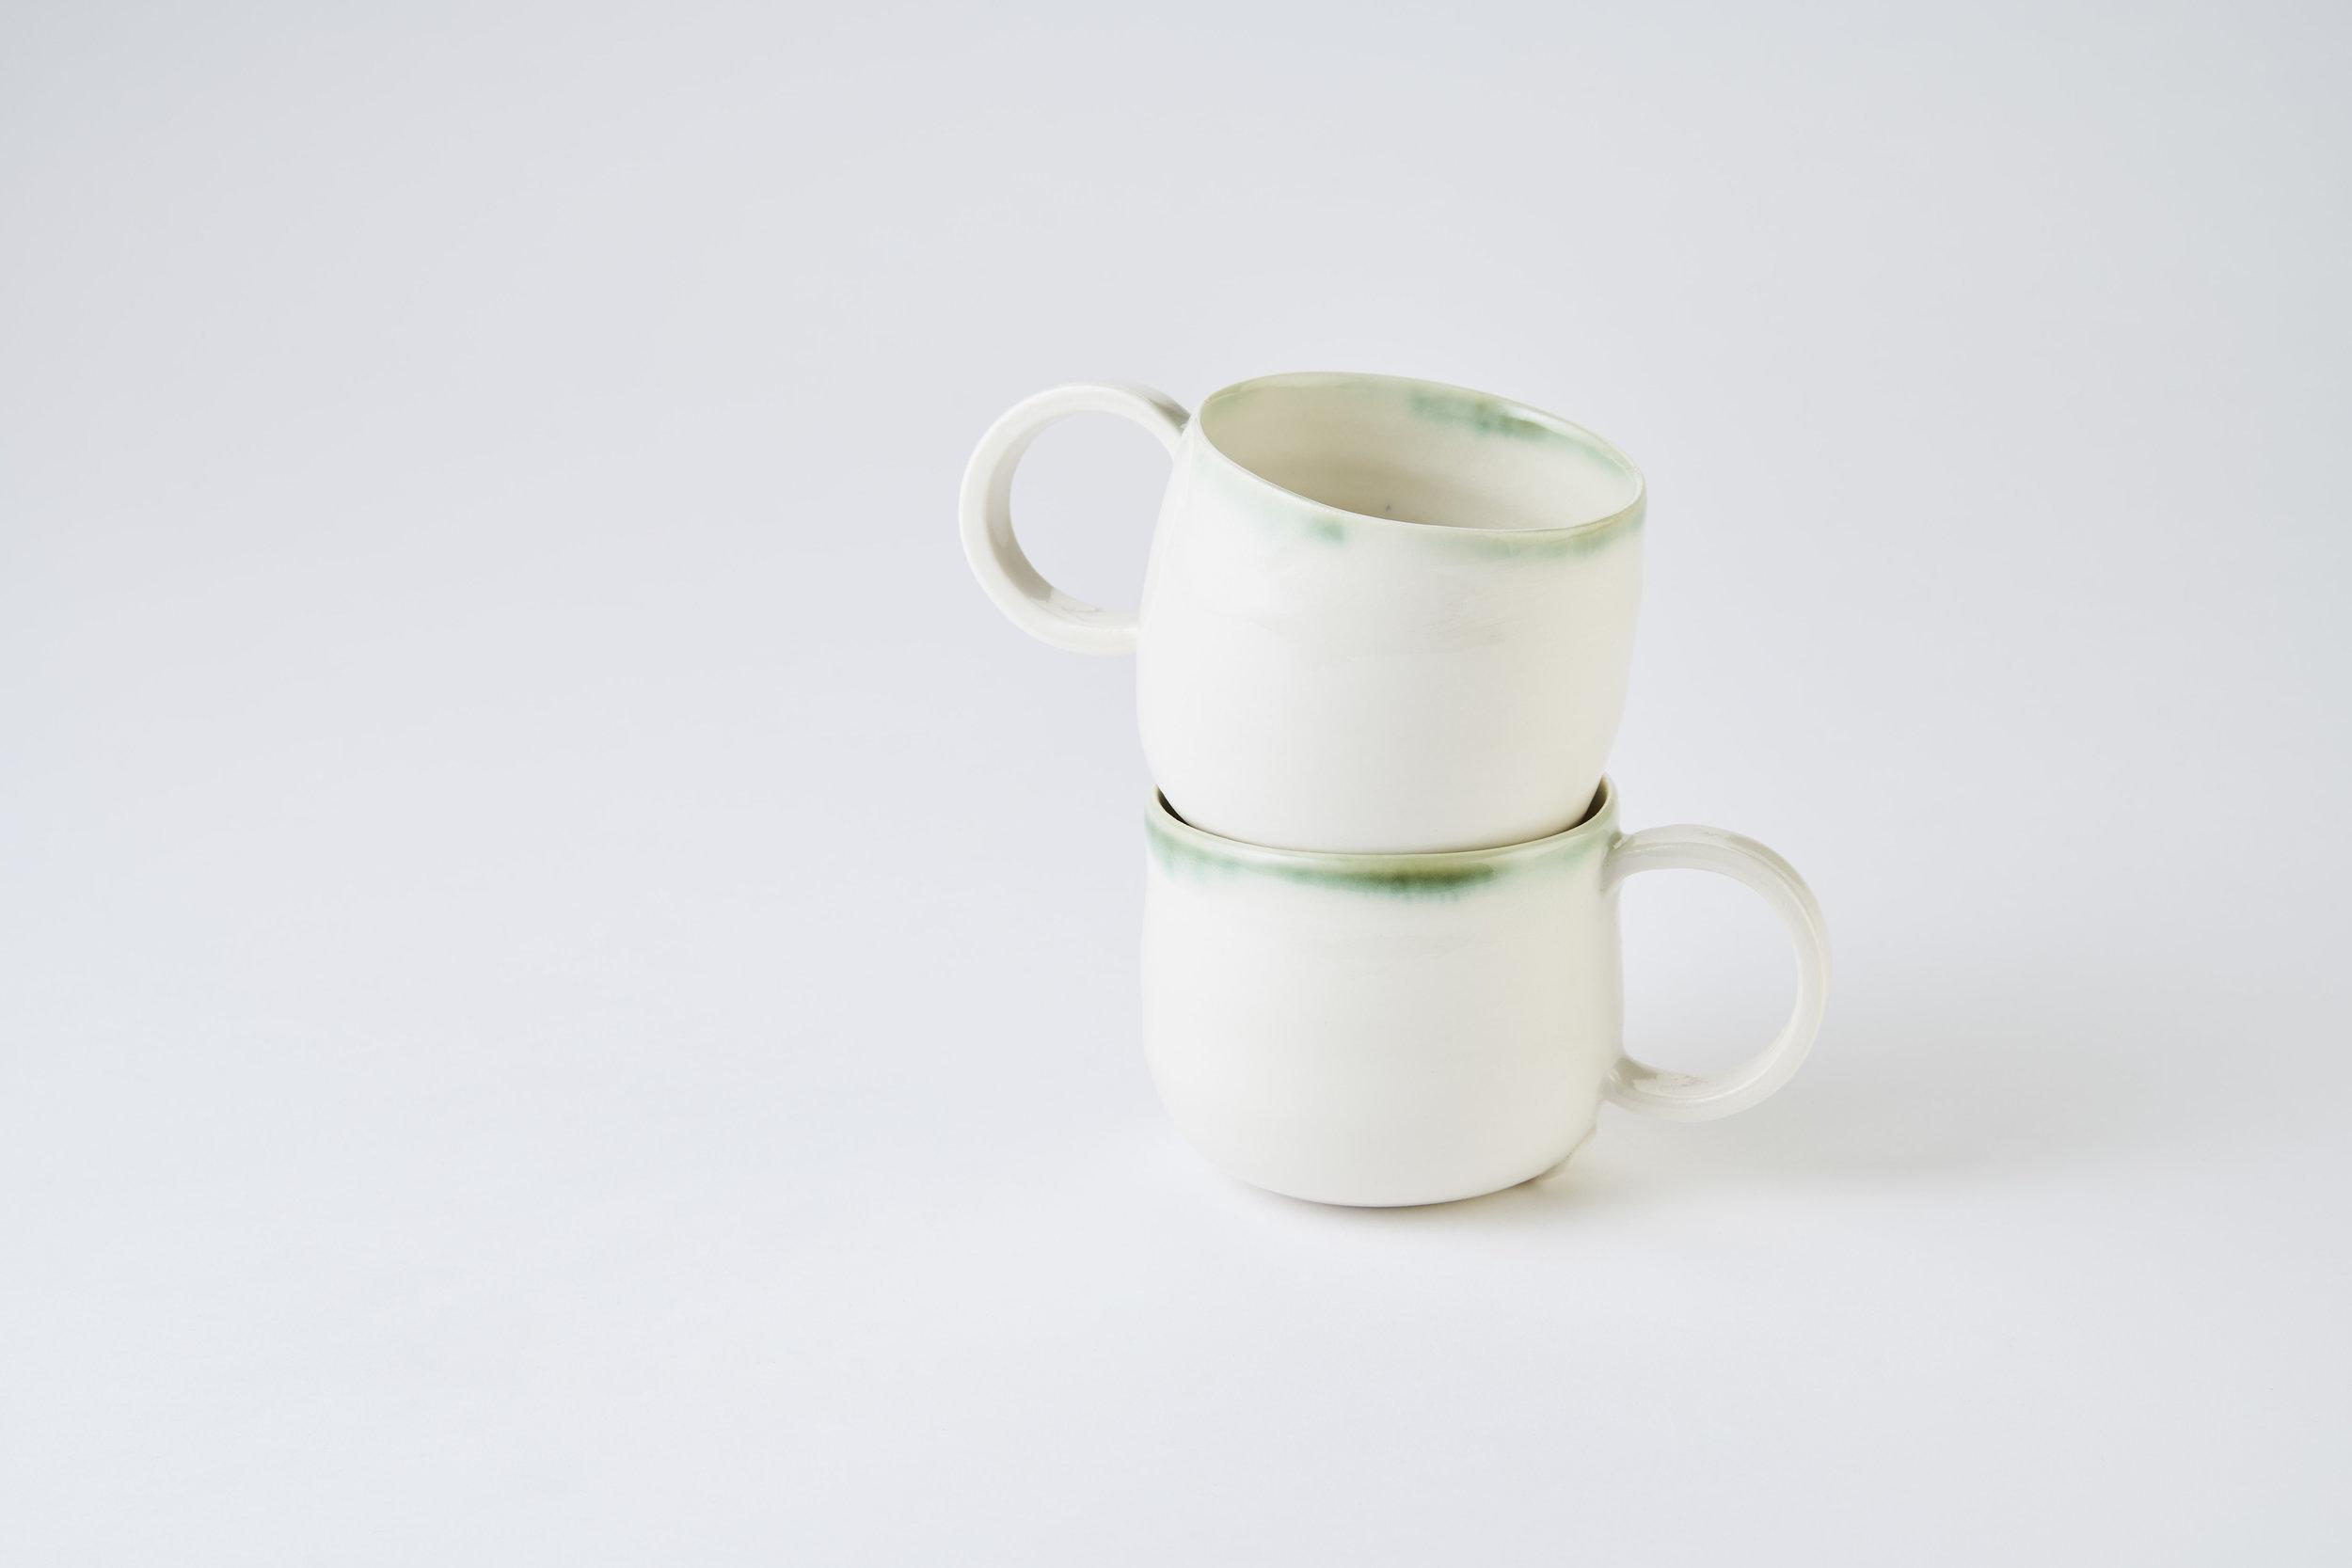 KA ceramics copper green rim cups with handles. Matthew Booth Photography.jpg